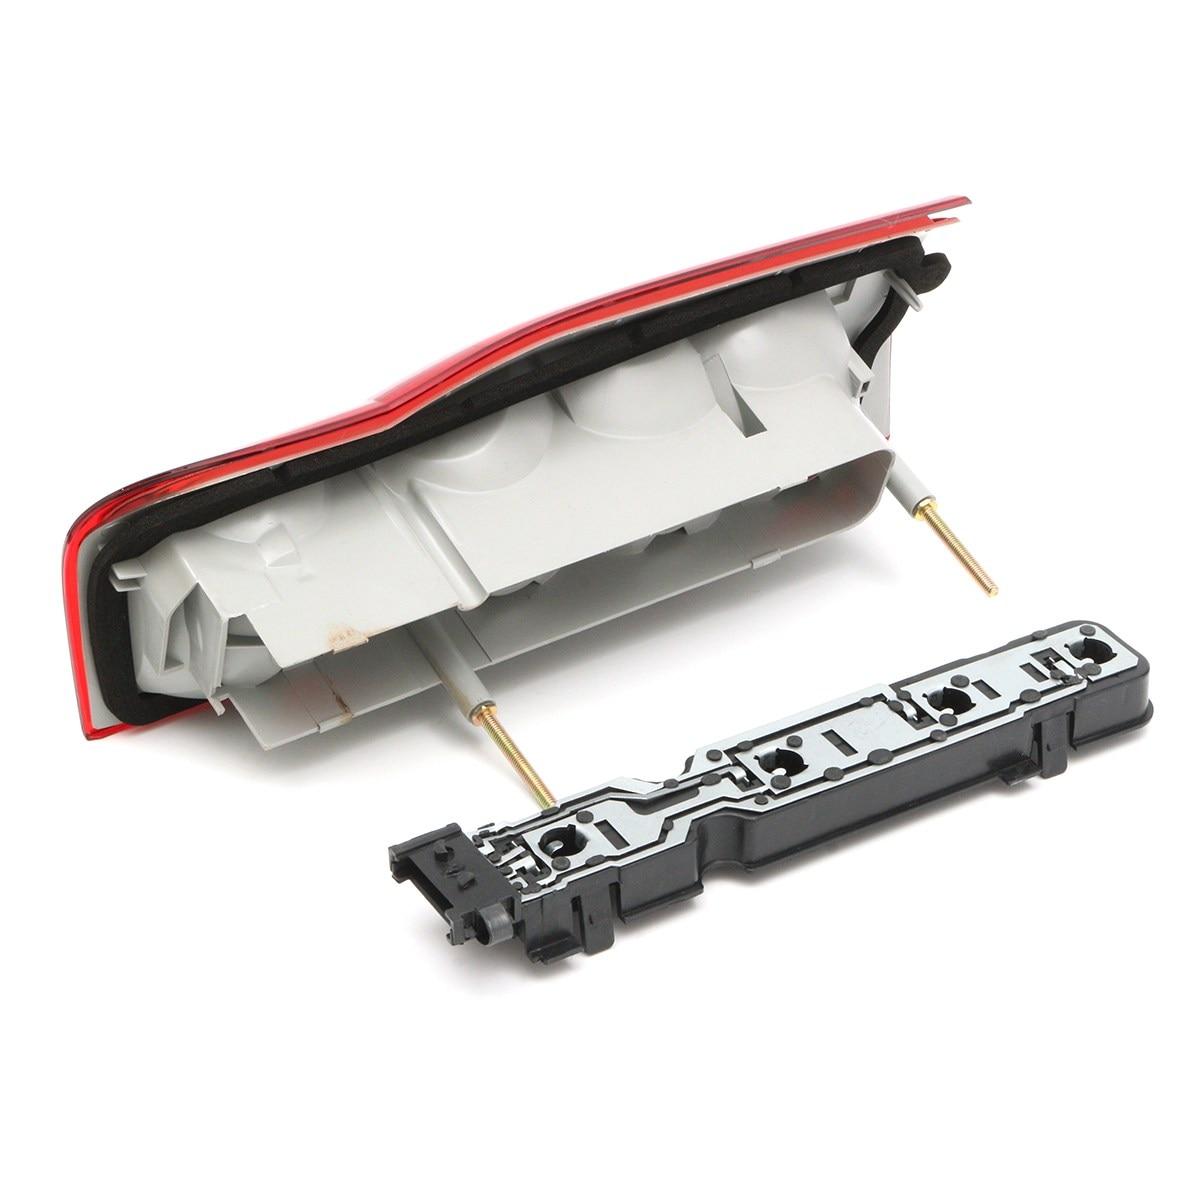 1Pcs Car Rear Back Tail Turn Light Lamp Projector Lens Left Side For Ford TRANSIT VAN Mk7 2000-2006